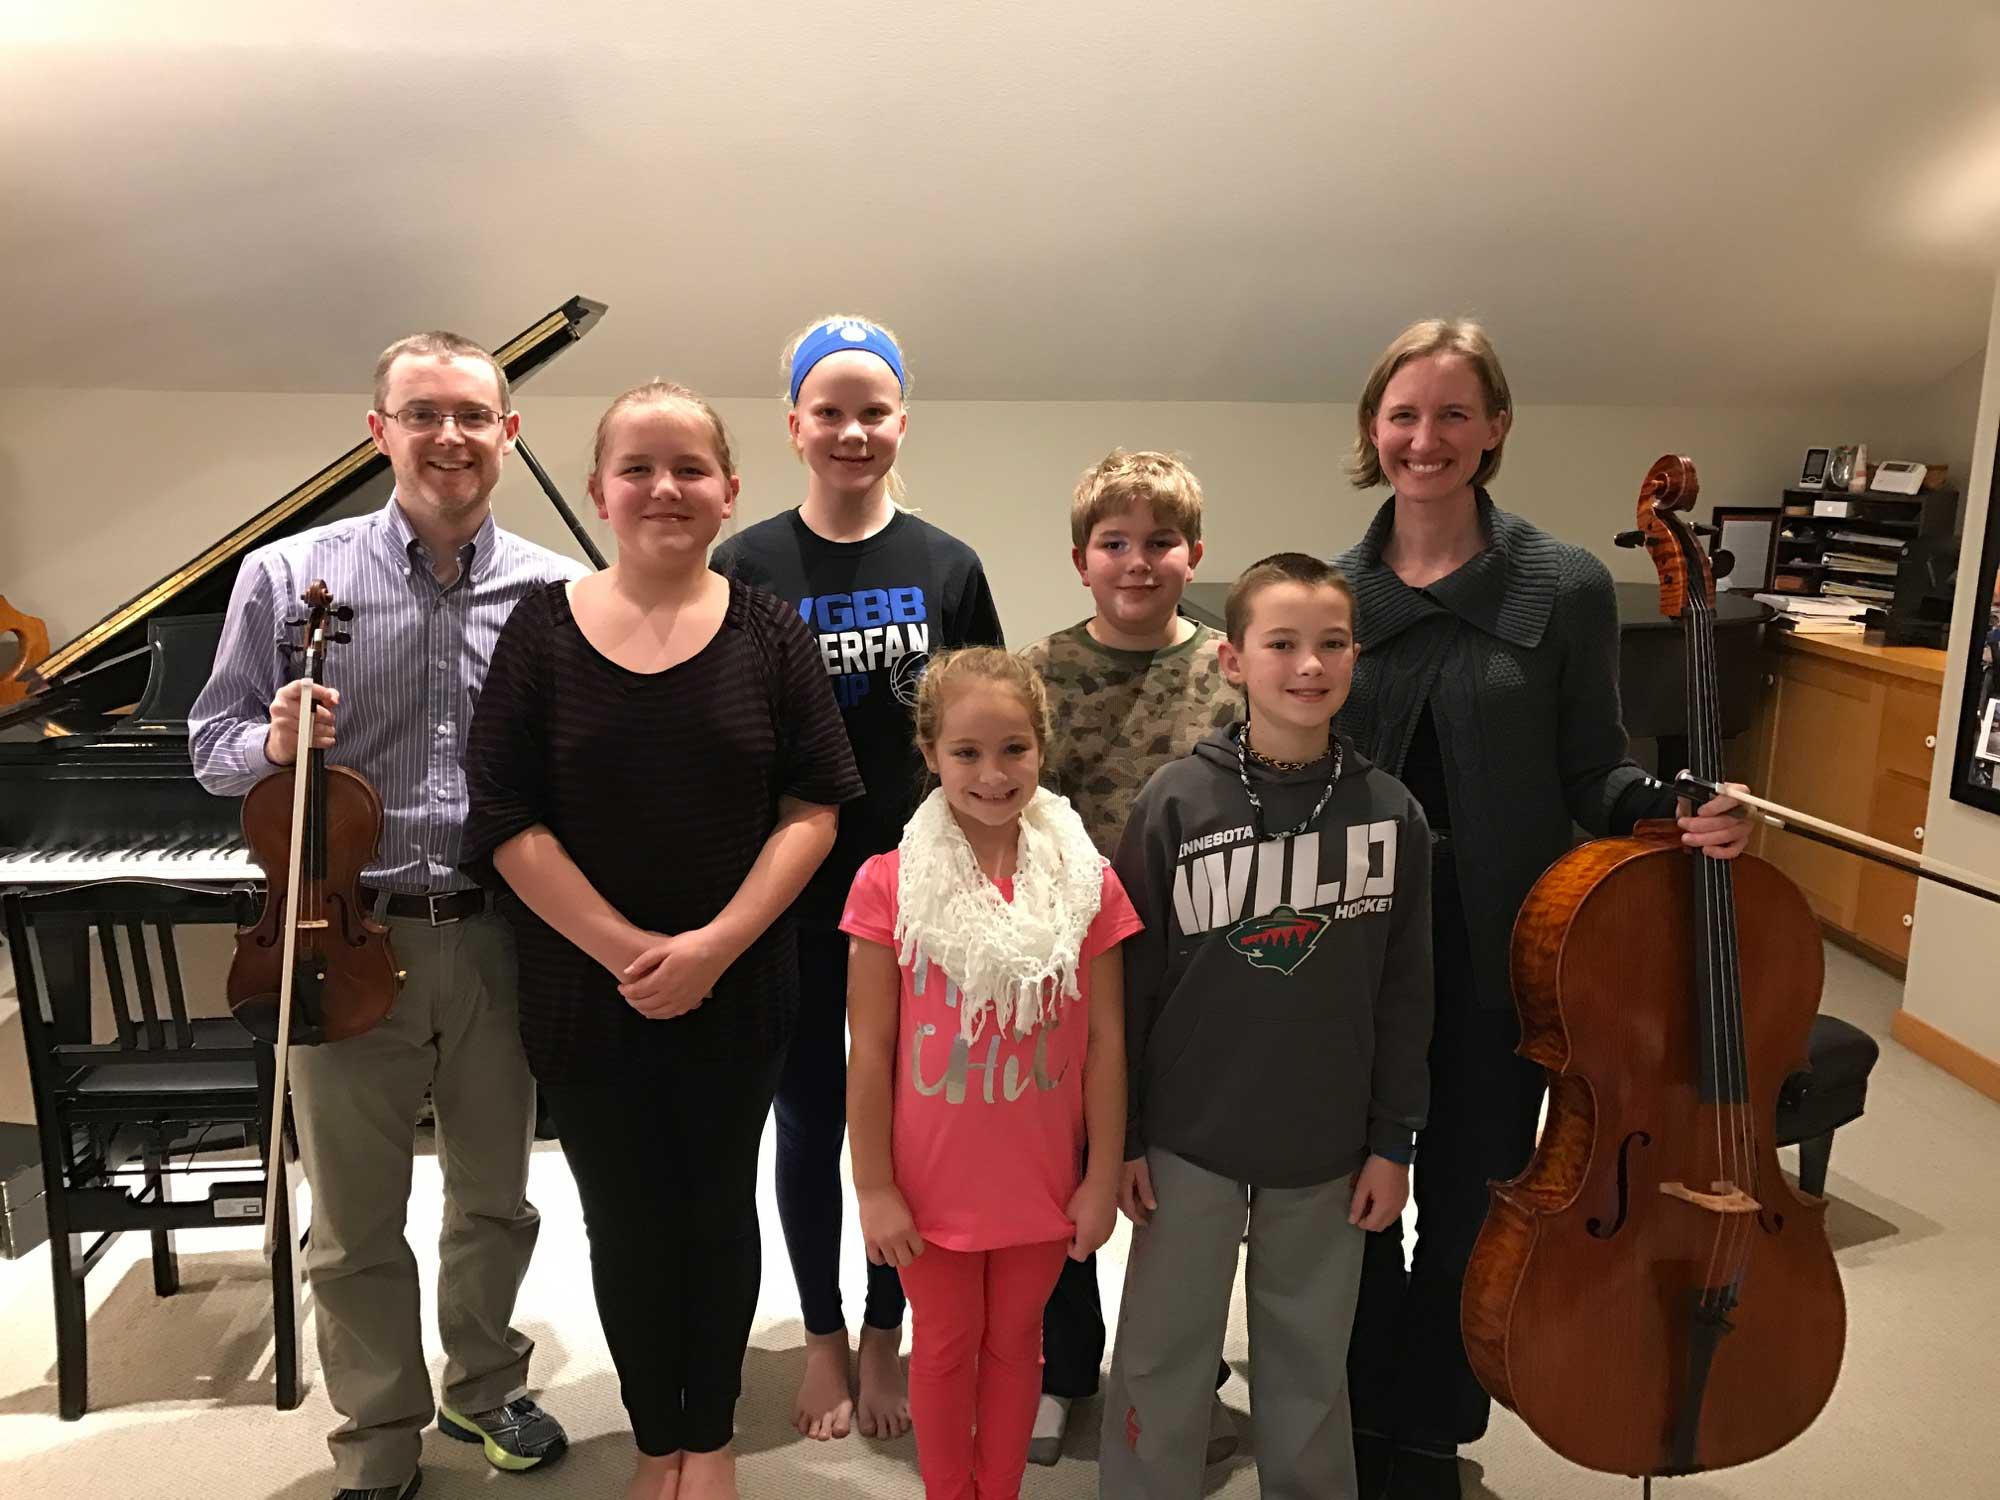 Chamber-Music-2016-Britta,-Peter,-Carly,-Sam-and-Elizabeth.jpg